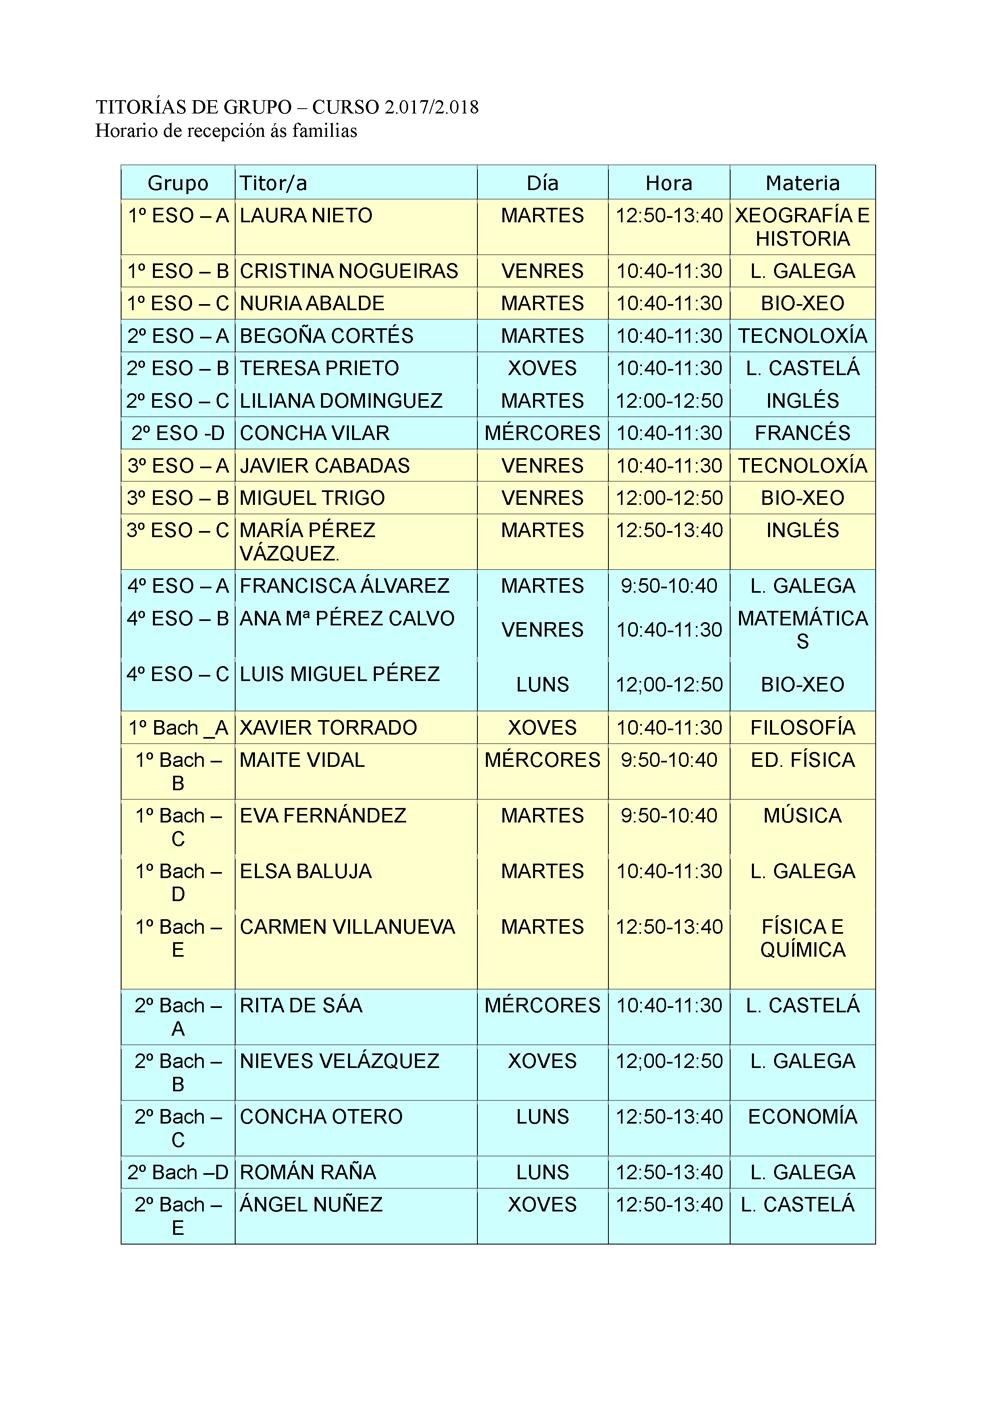 horario-titorias-2017-2018.jpg